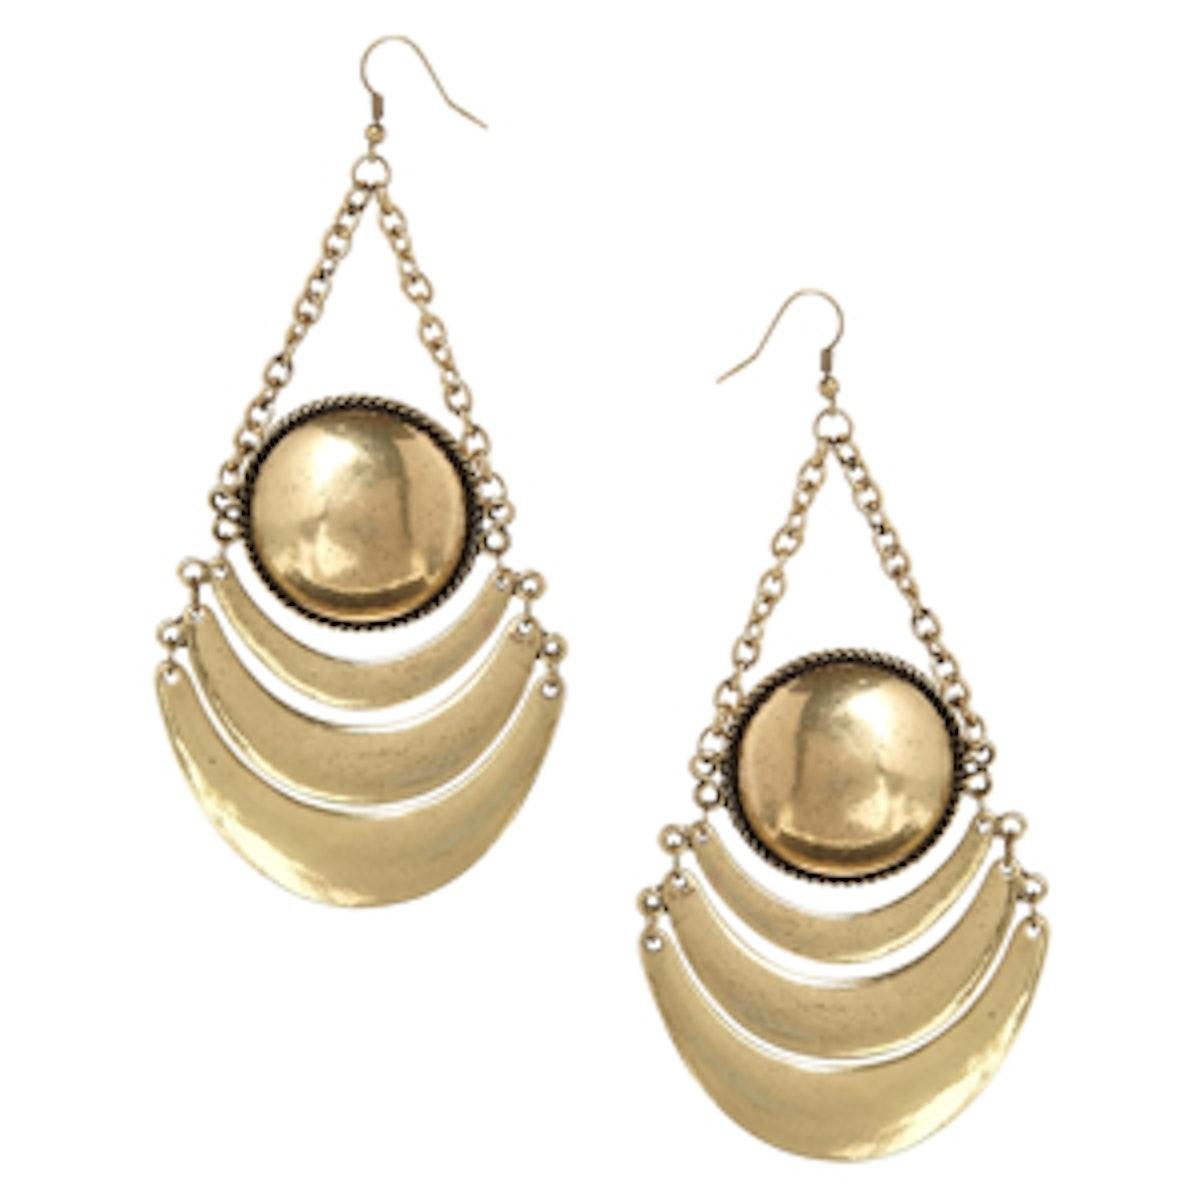 Boho Festival Earrings